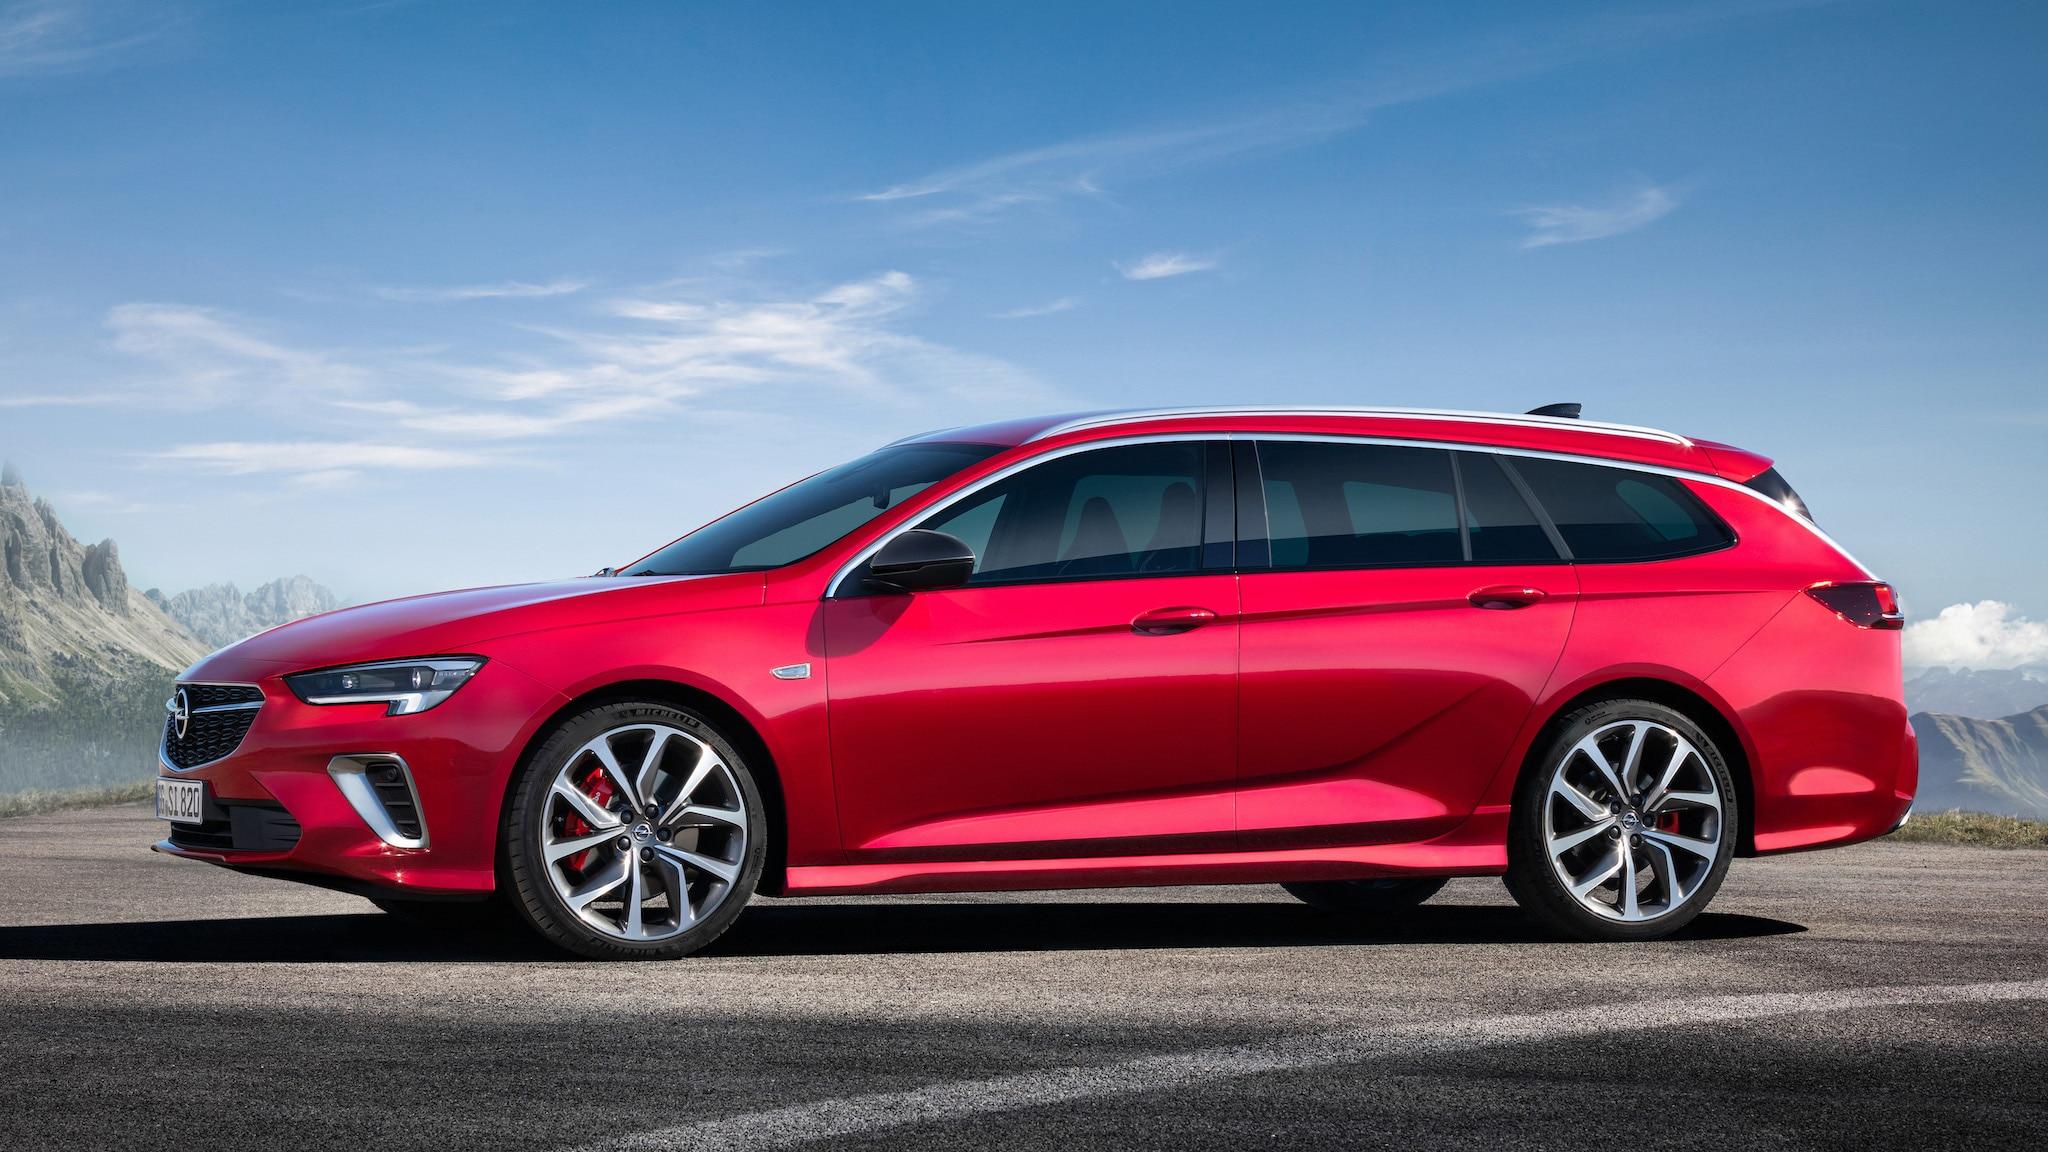 The Buick Regal TourX Wagon Just Got Even Better for 2020—as an Opel